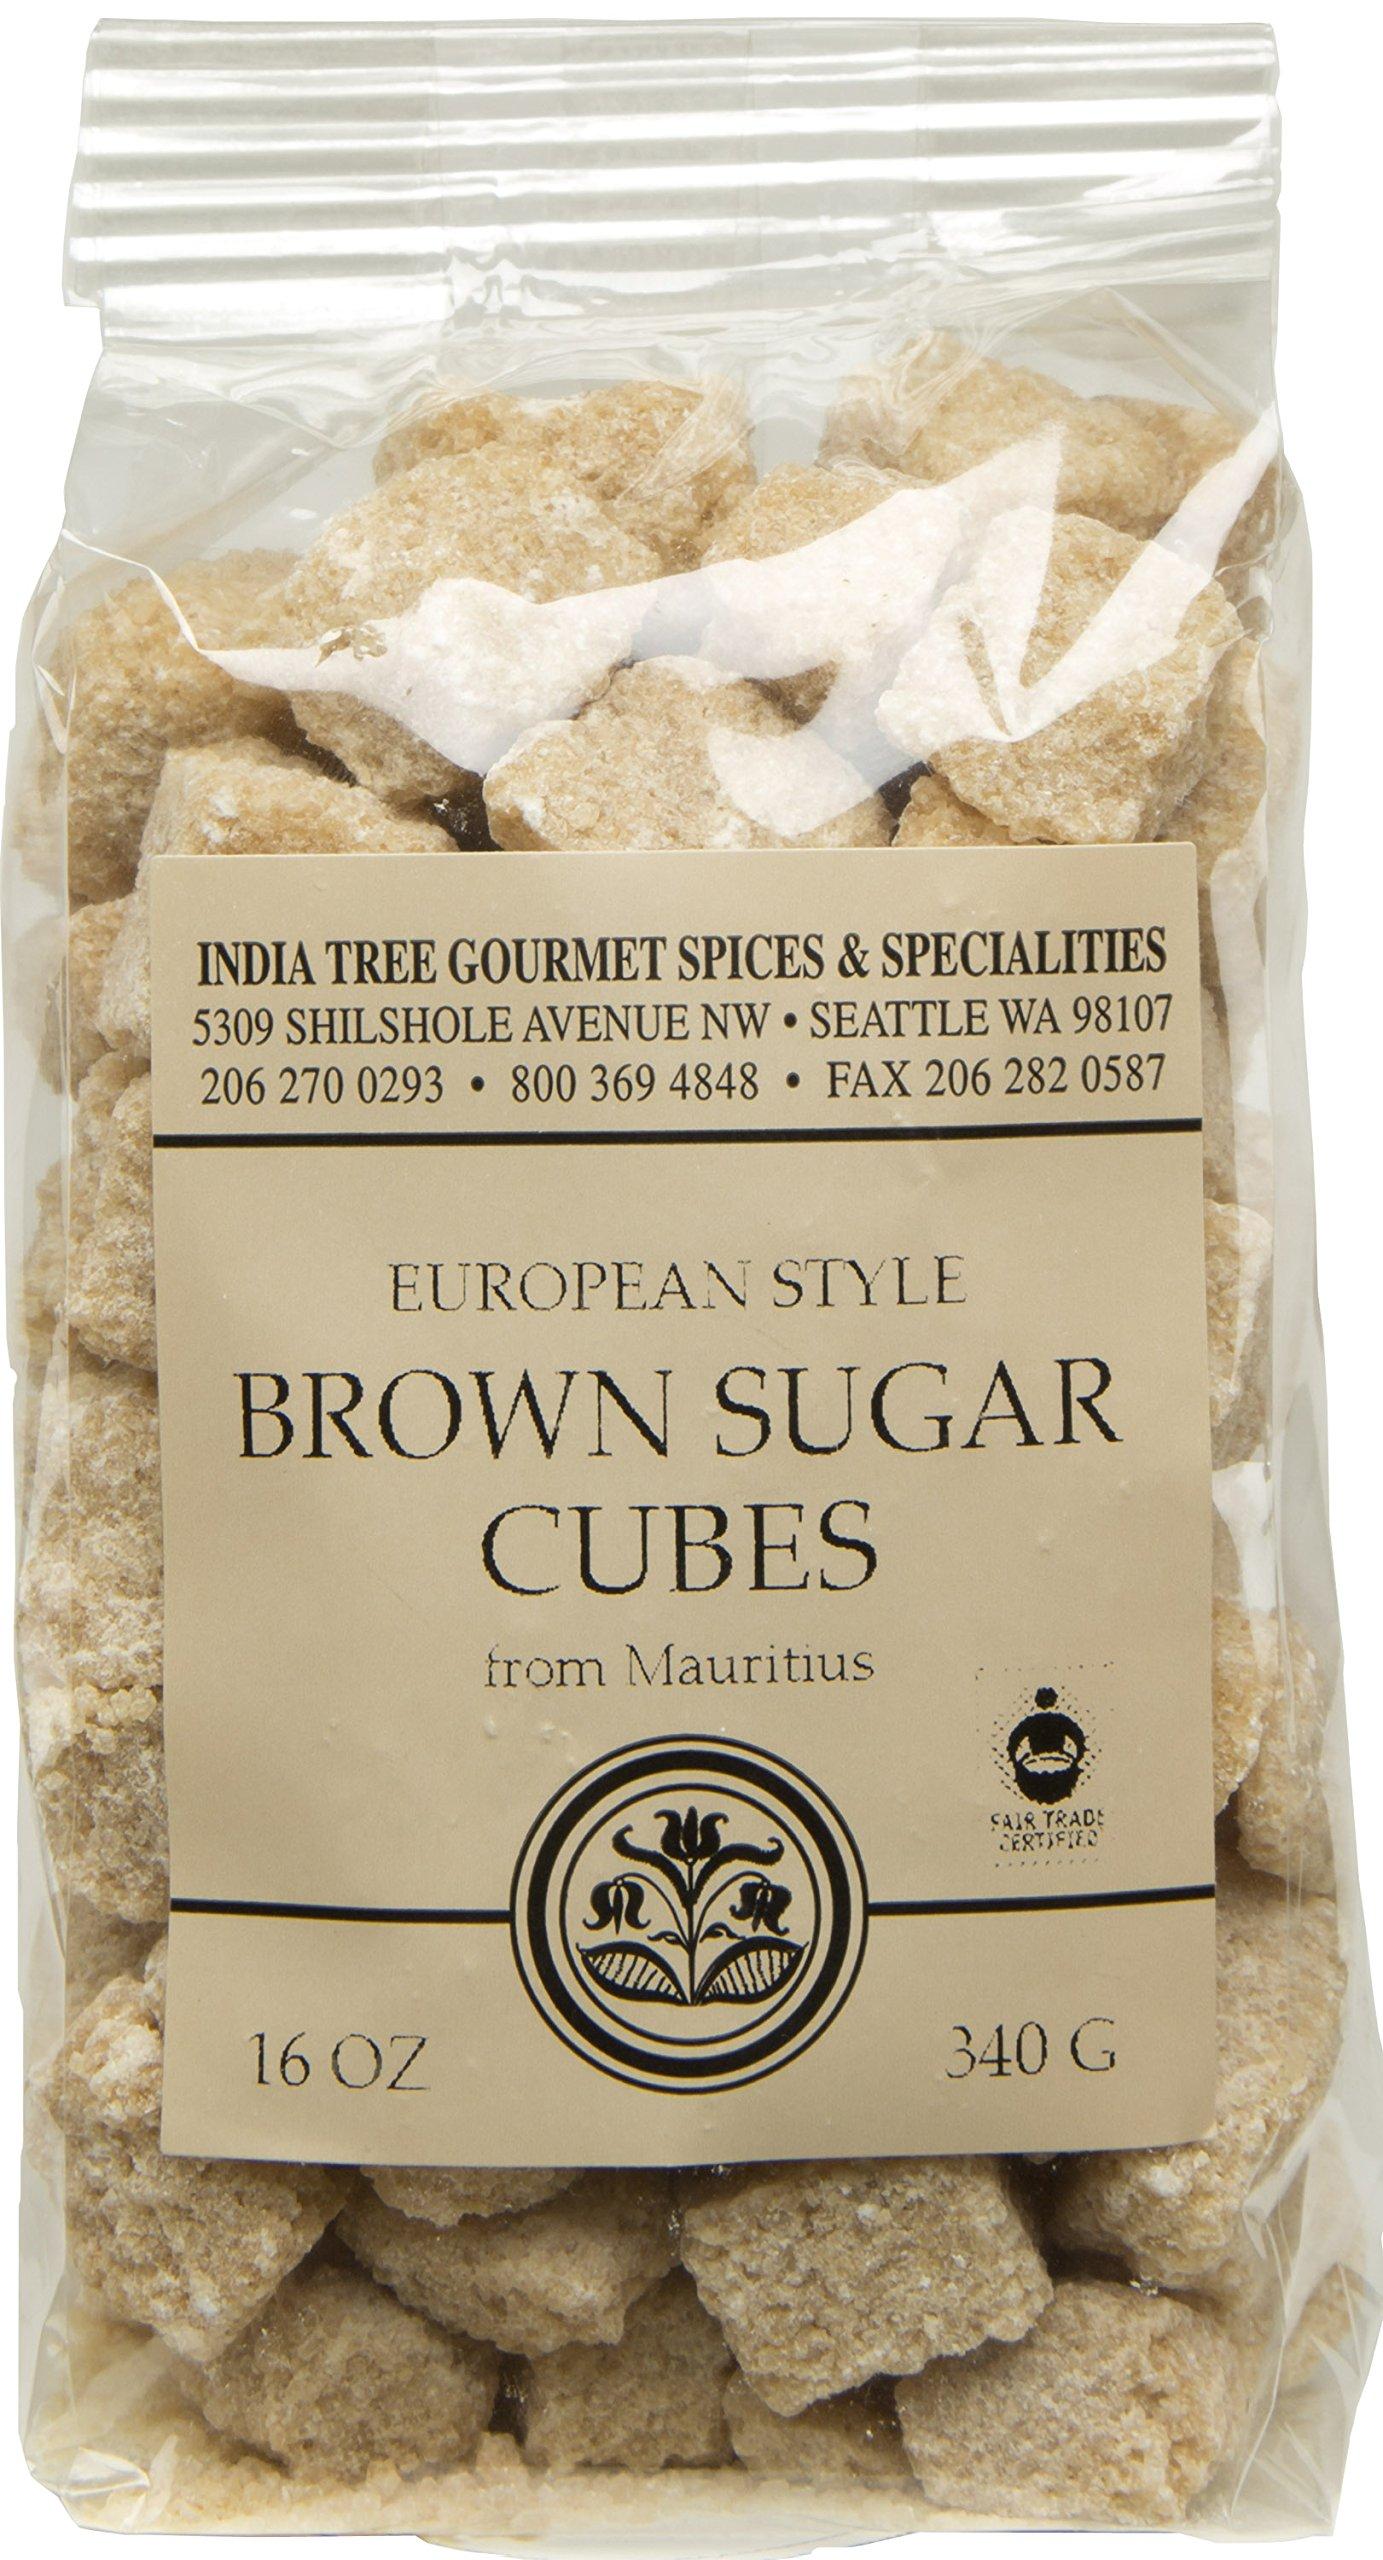 India Tree Brown European-Style Sugar Cubes, 12 oz Bag (Pack of 3)